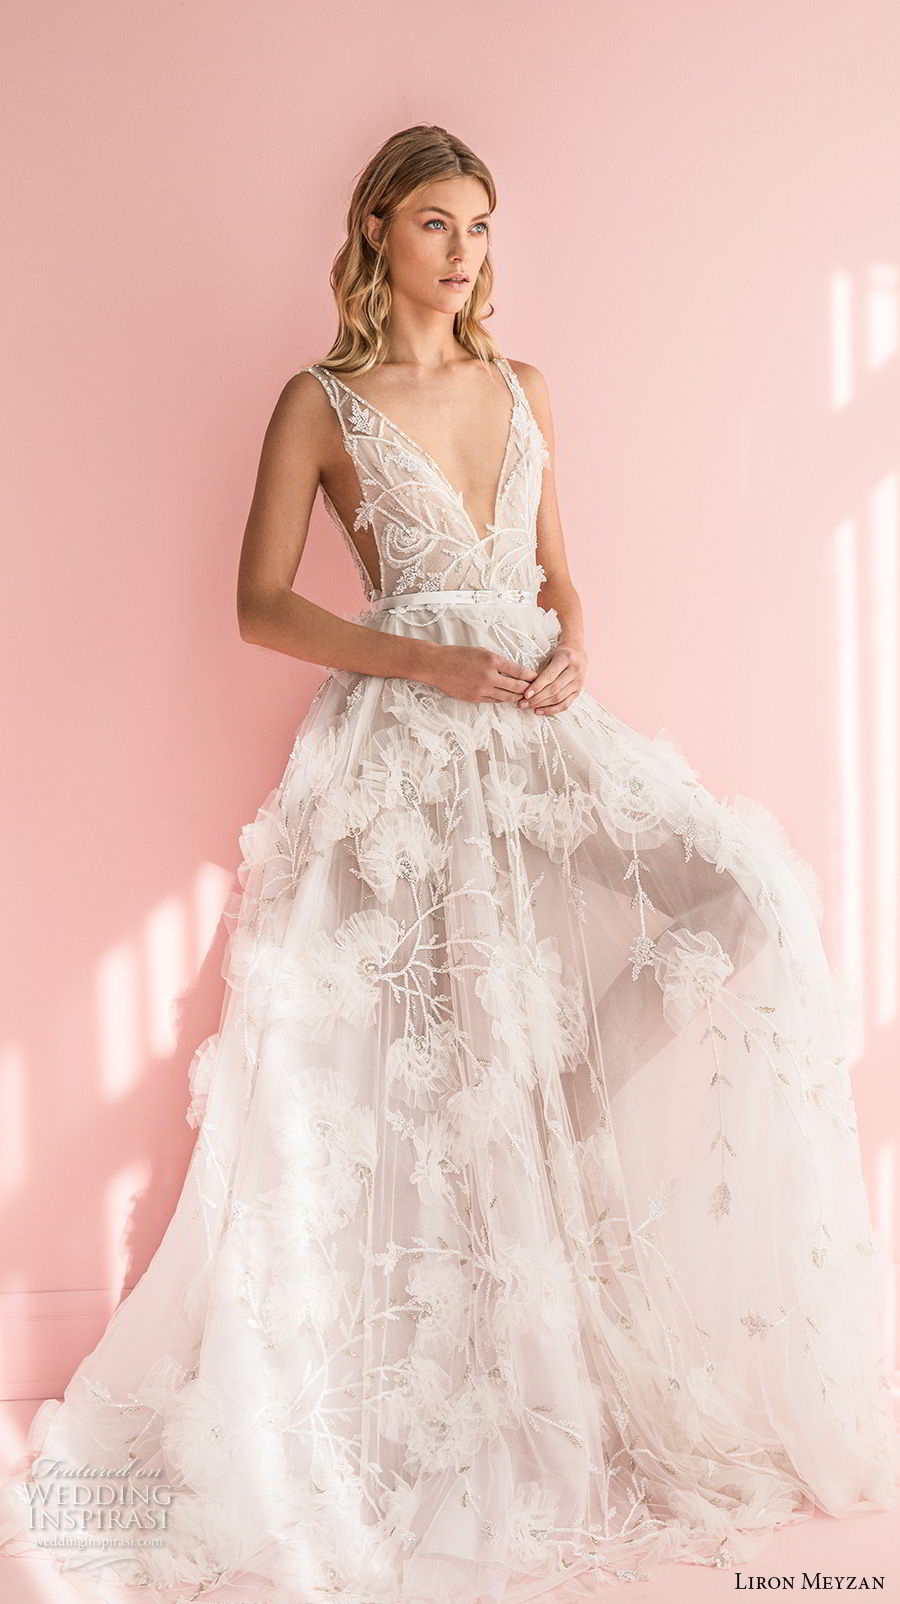 Liron meyzan 2018 wedding dresses love in white bridal for I love wedding dresses